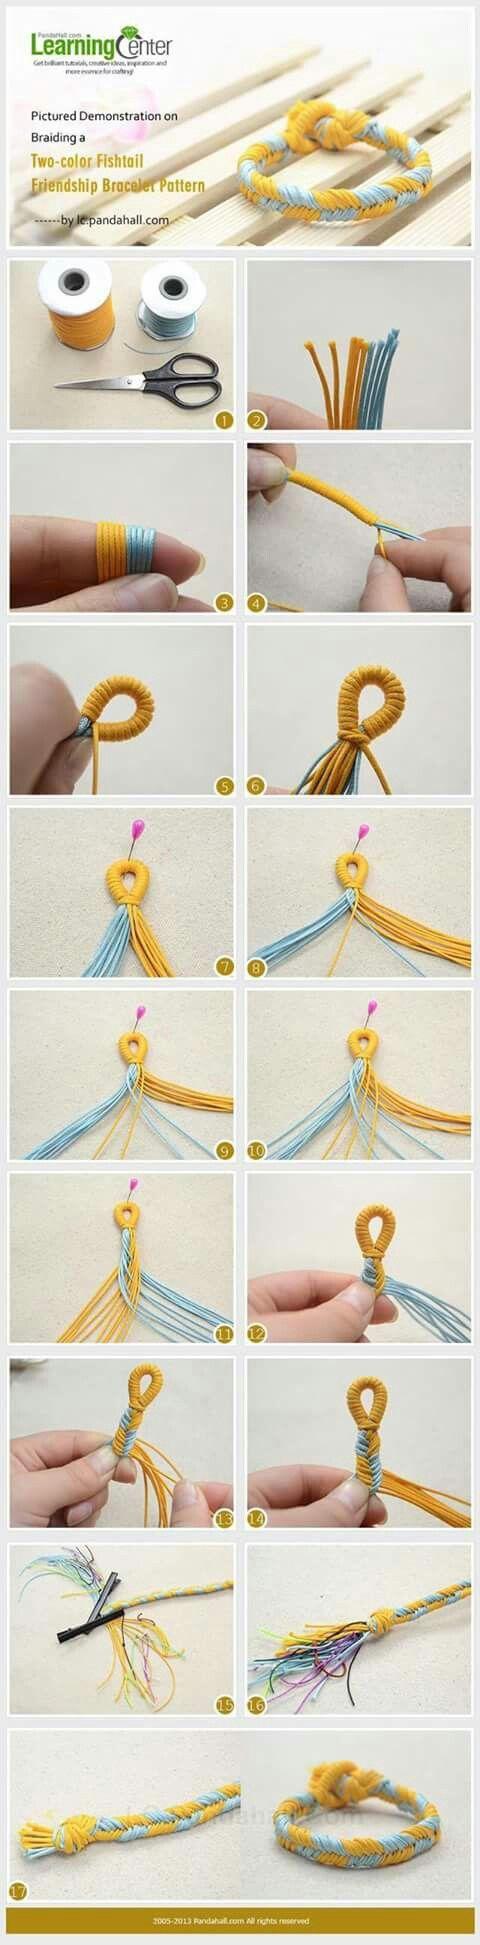 2 Color Fishtail- loop closure